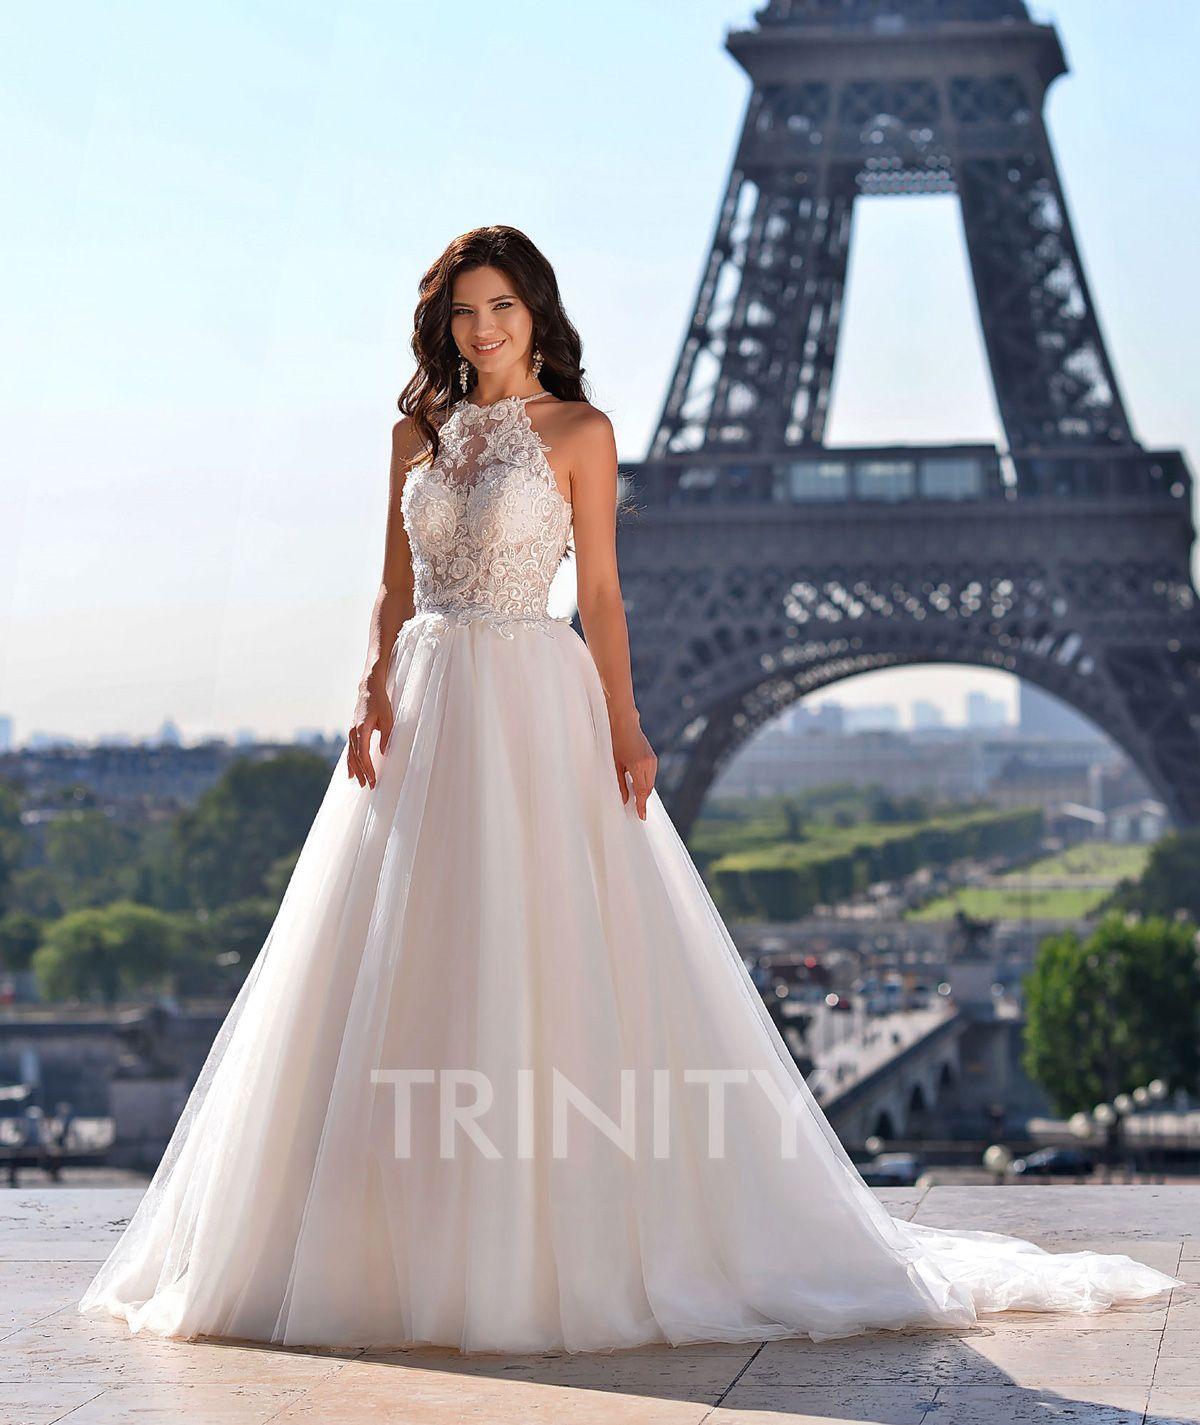 Beauty Ivory Tulle Halter Applique Beads A-Line Wedding Dresses Bridal Pageant Dresses Wedding Attire Dresses Custom Size 2-18 KF1228317